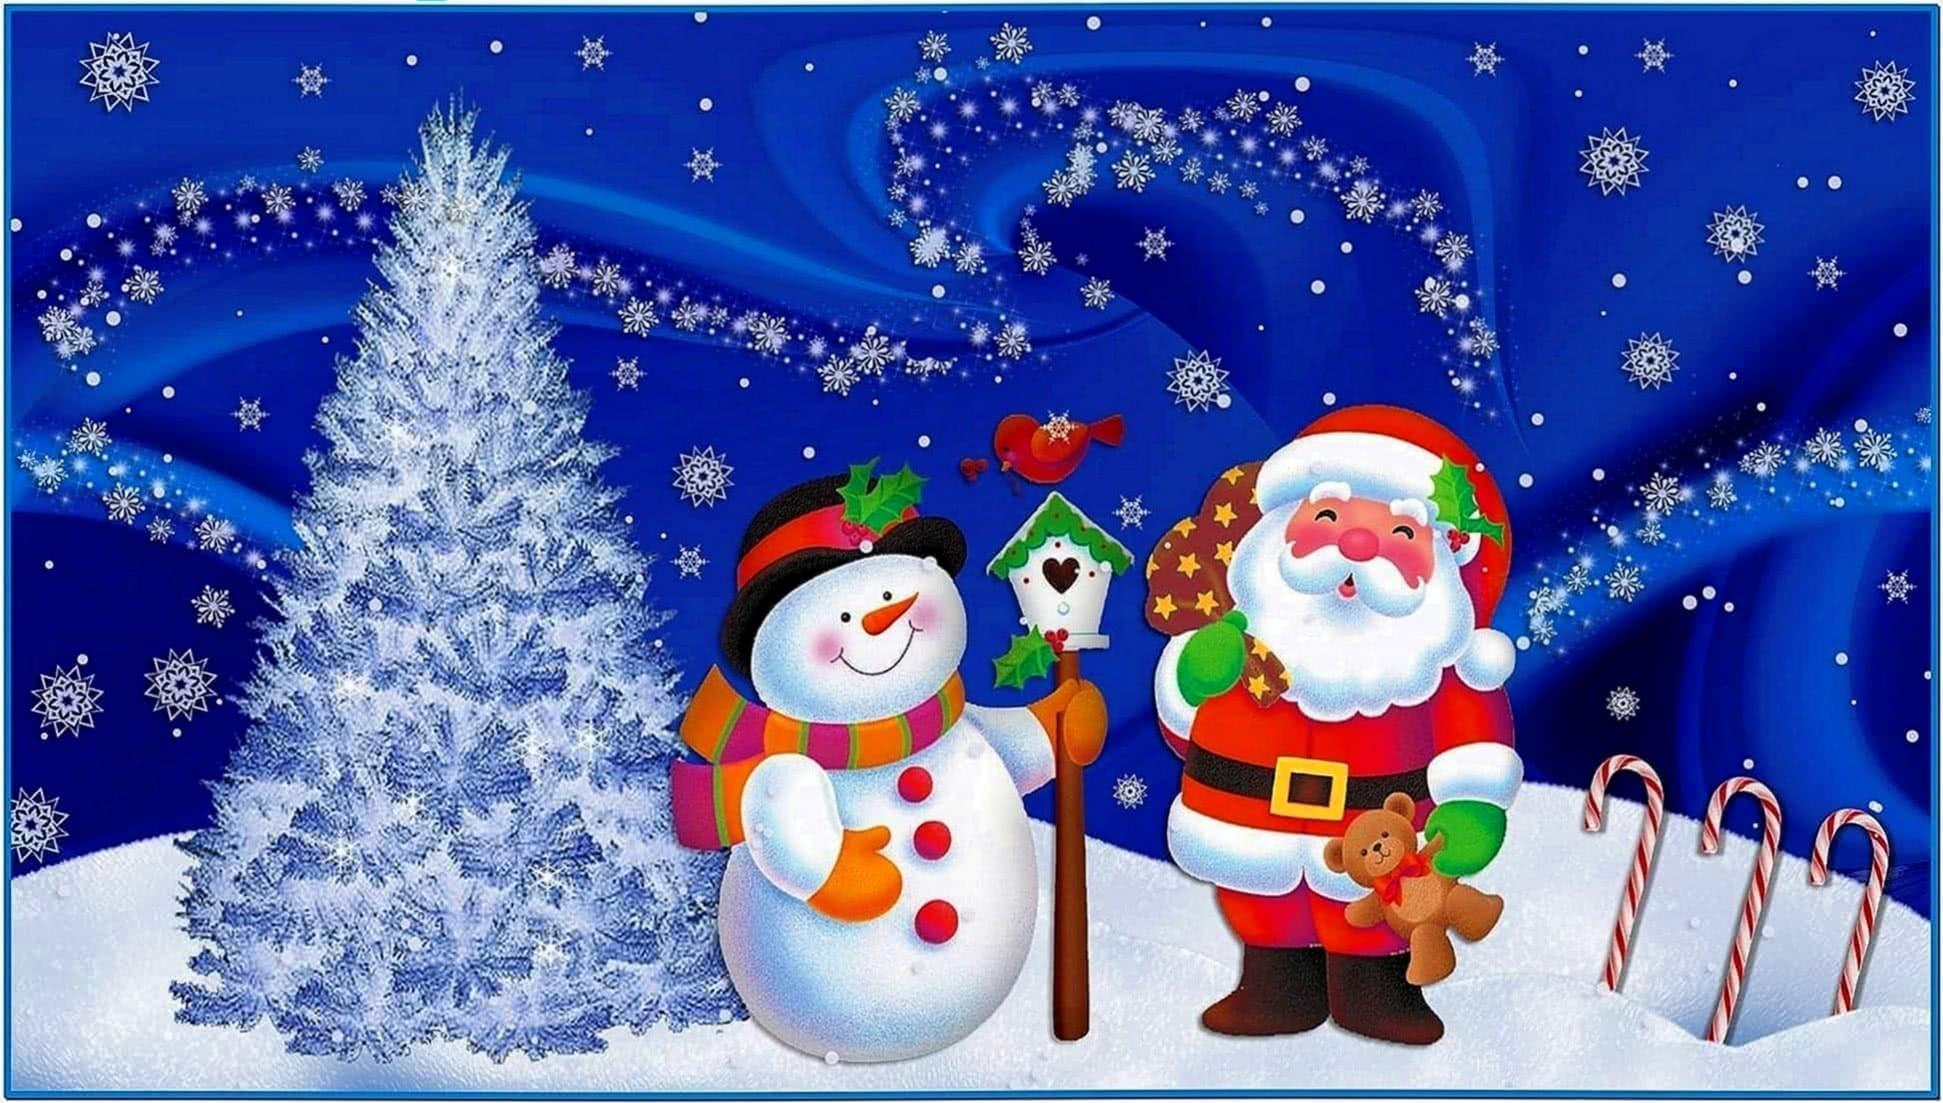 Screensaver and Wallpaper Christmas